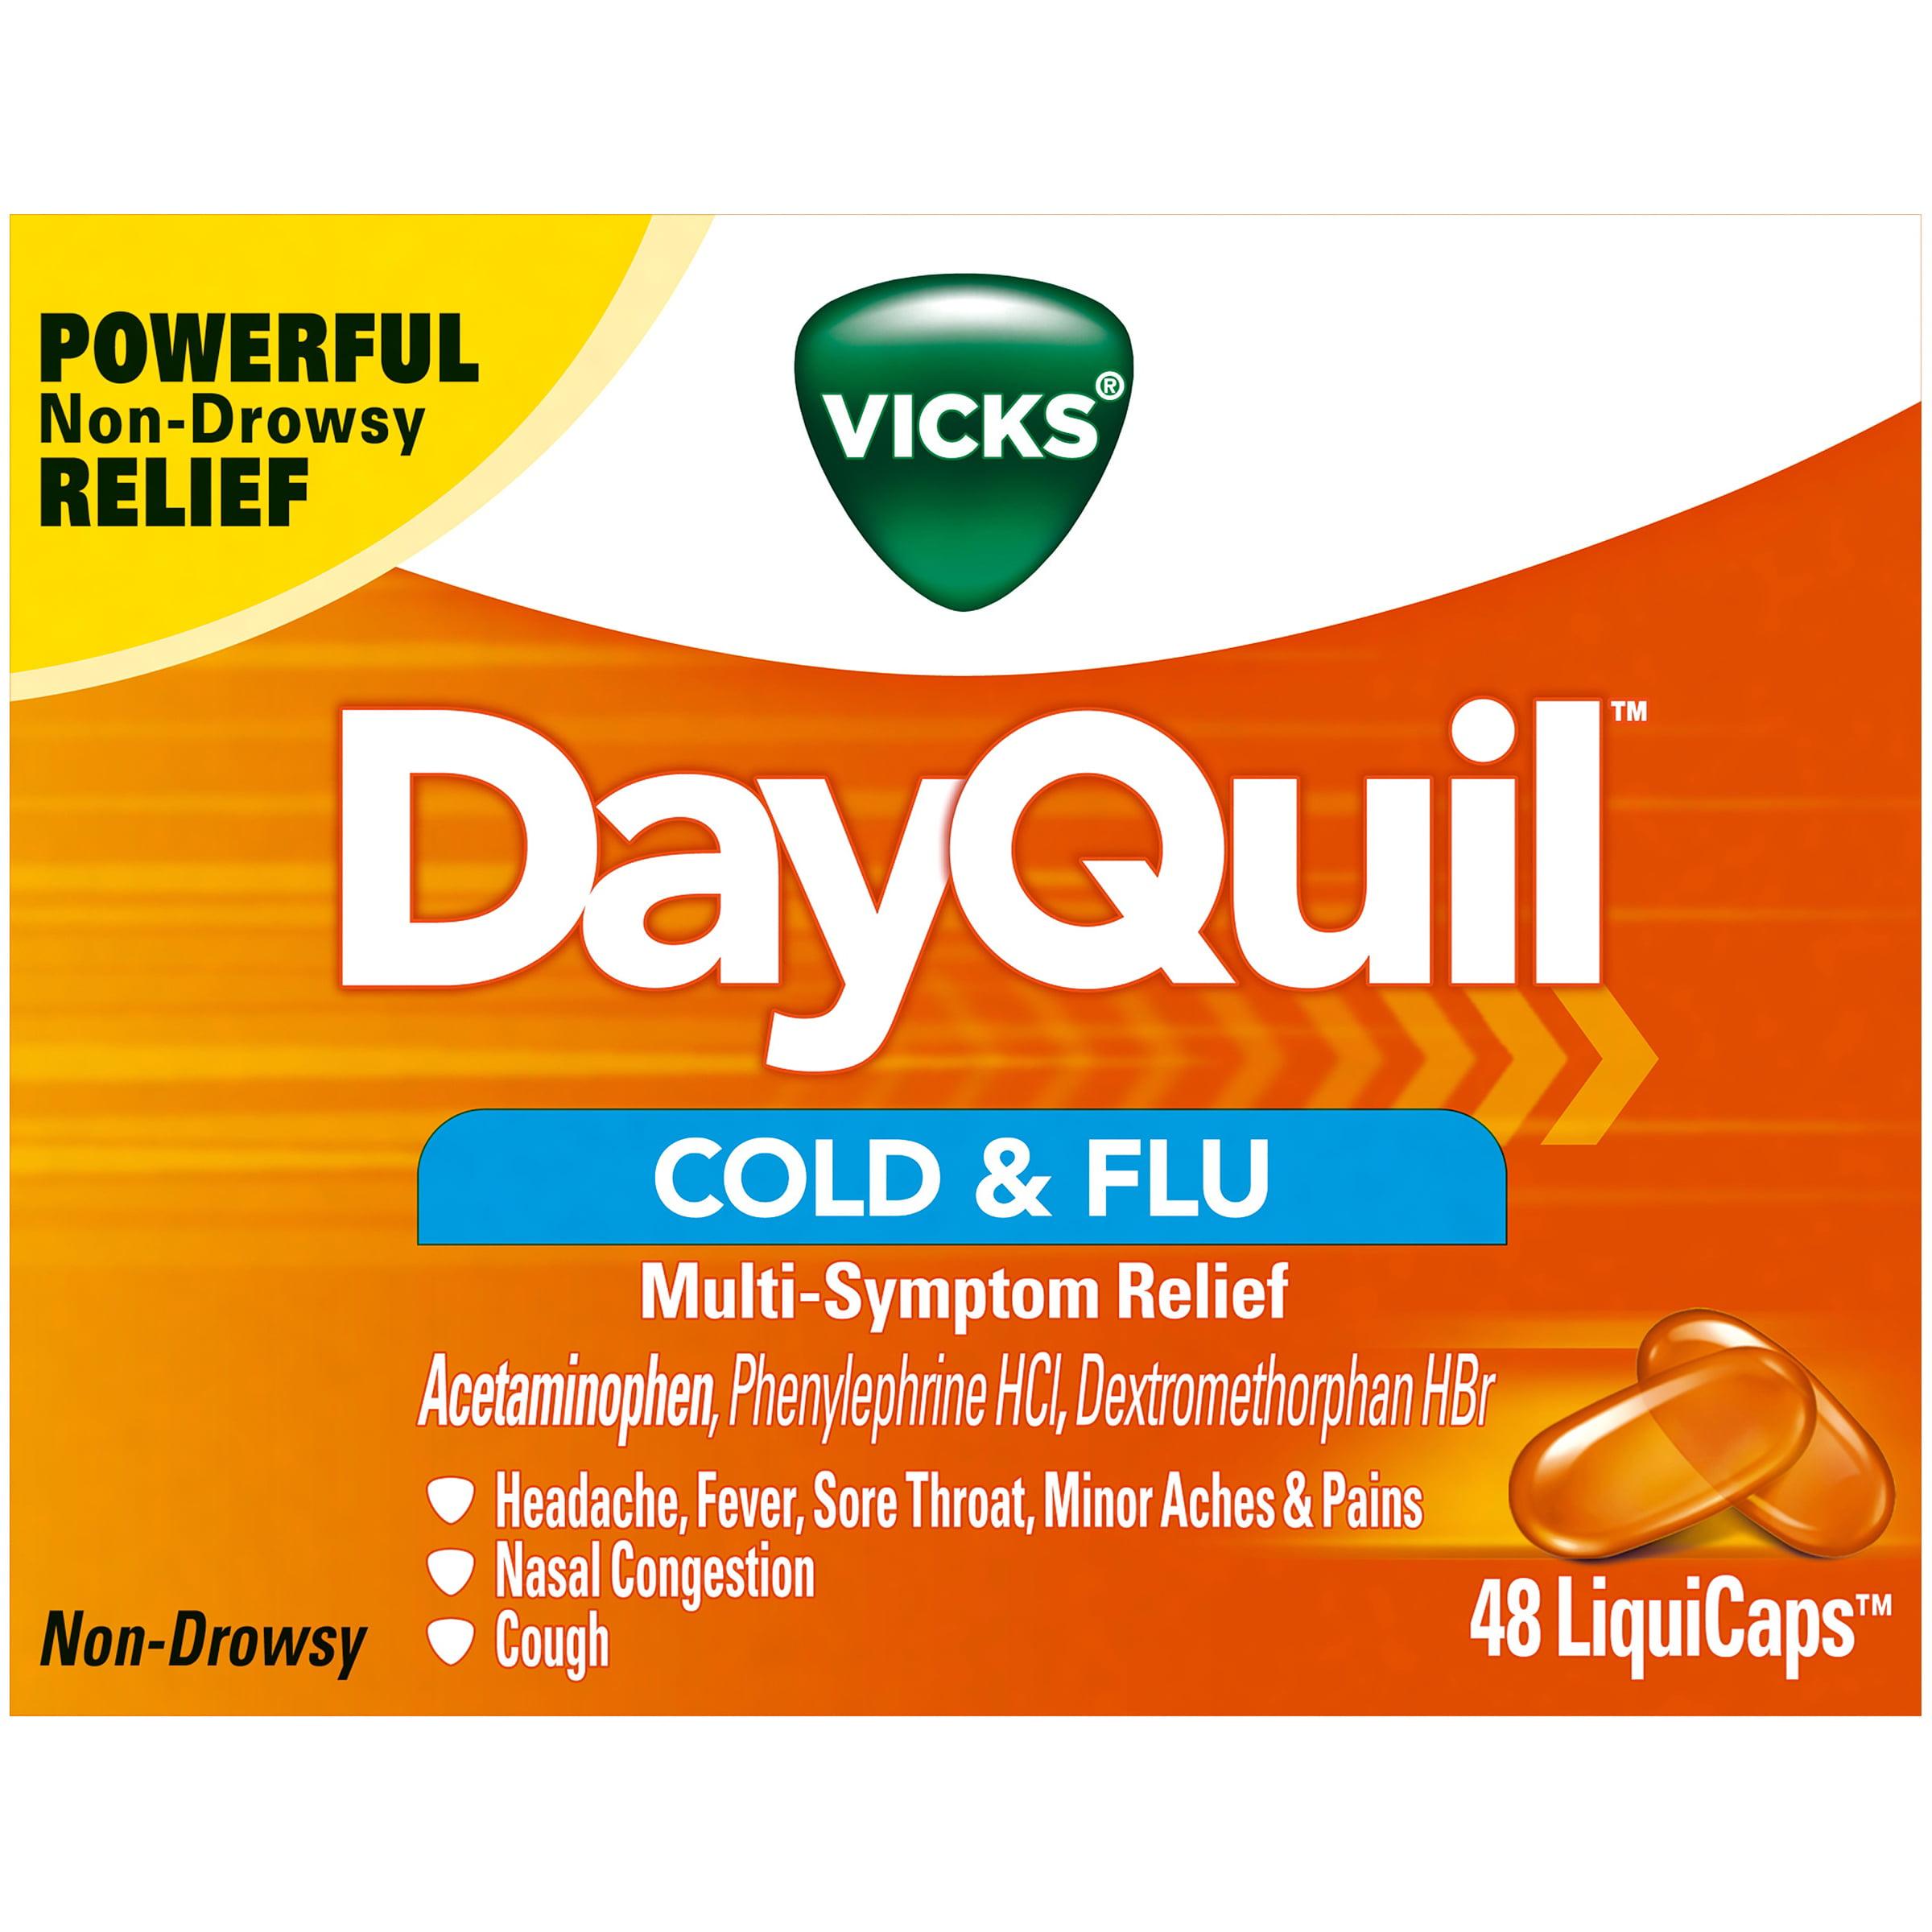 Vicks® DayQuil™ Cold & Flu Multi-Symptom Relief LiquiCaps™ 48 ct Box